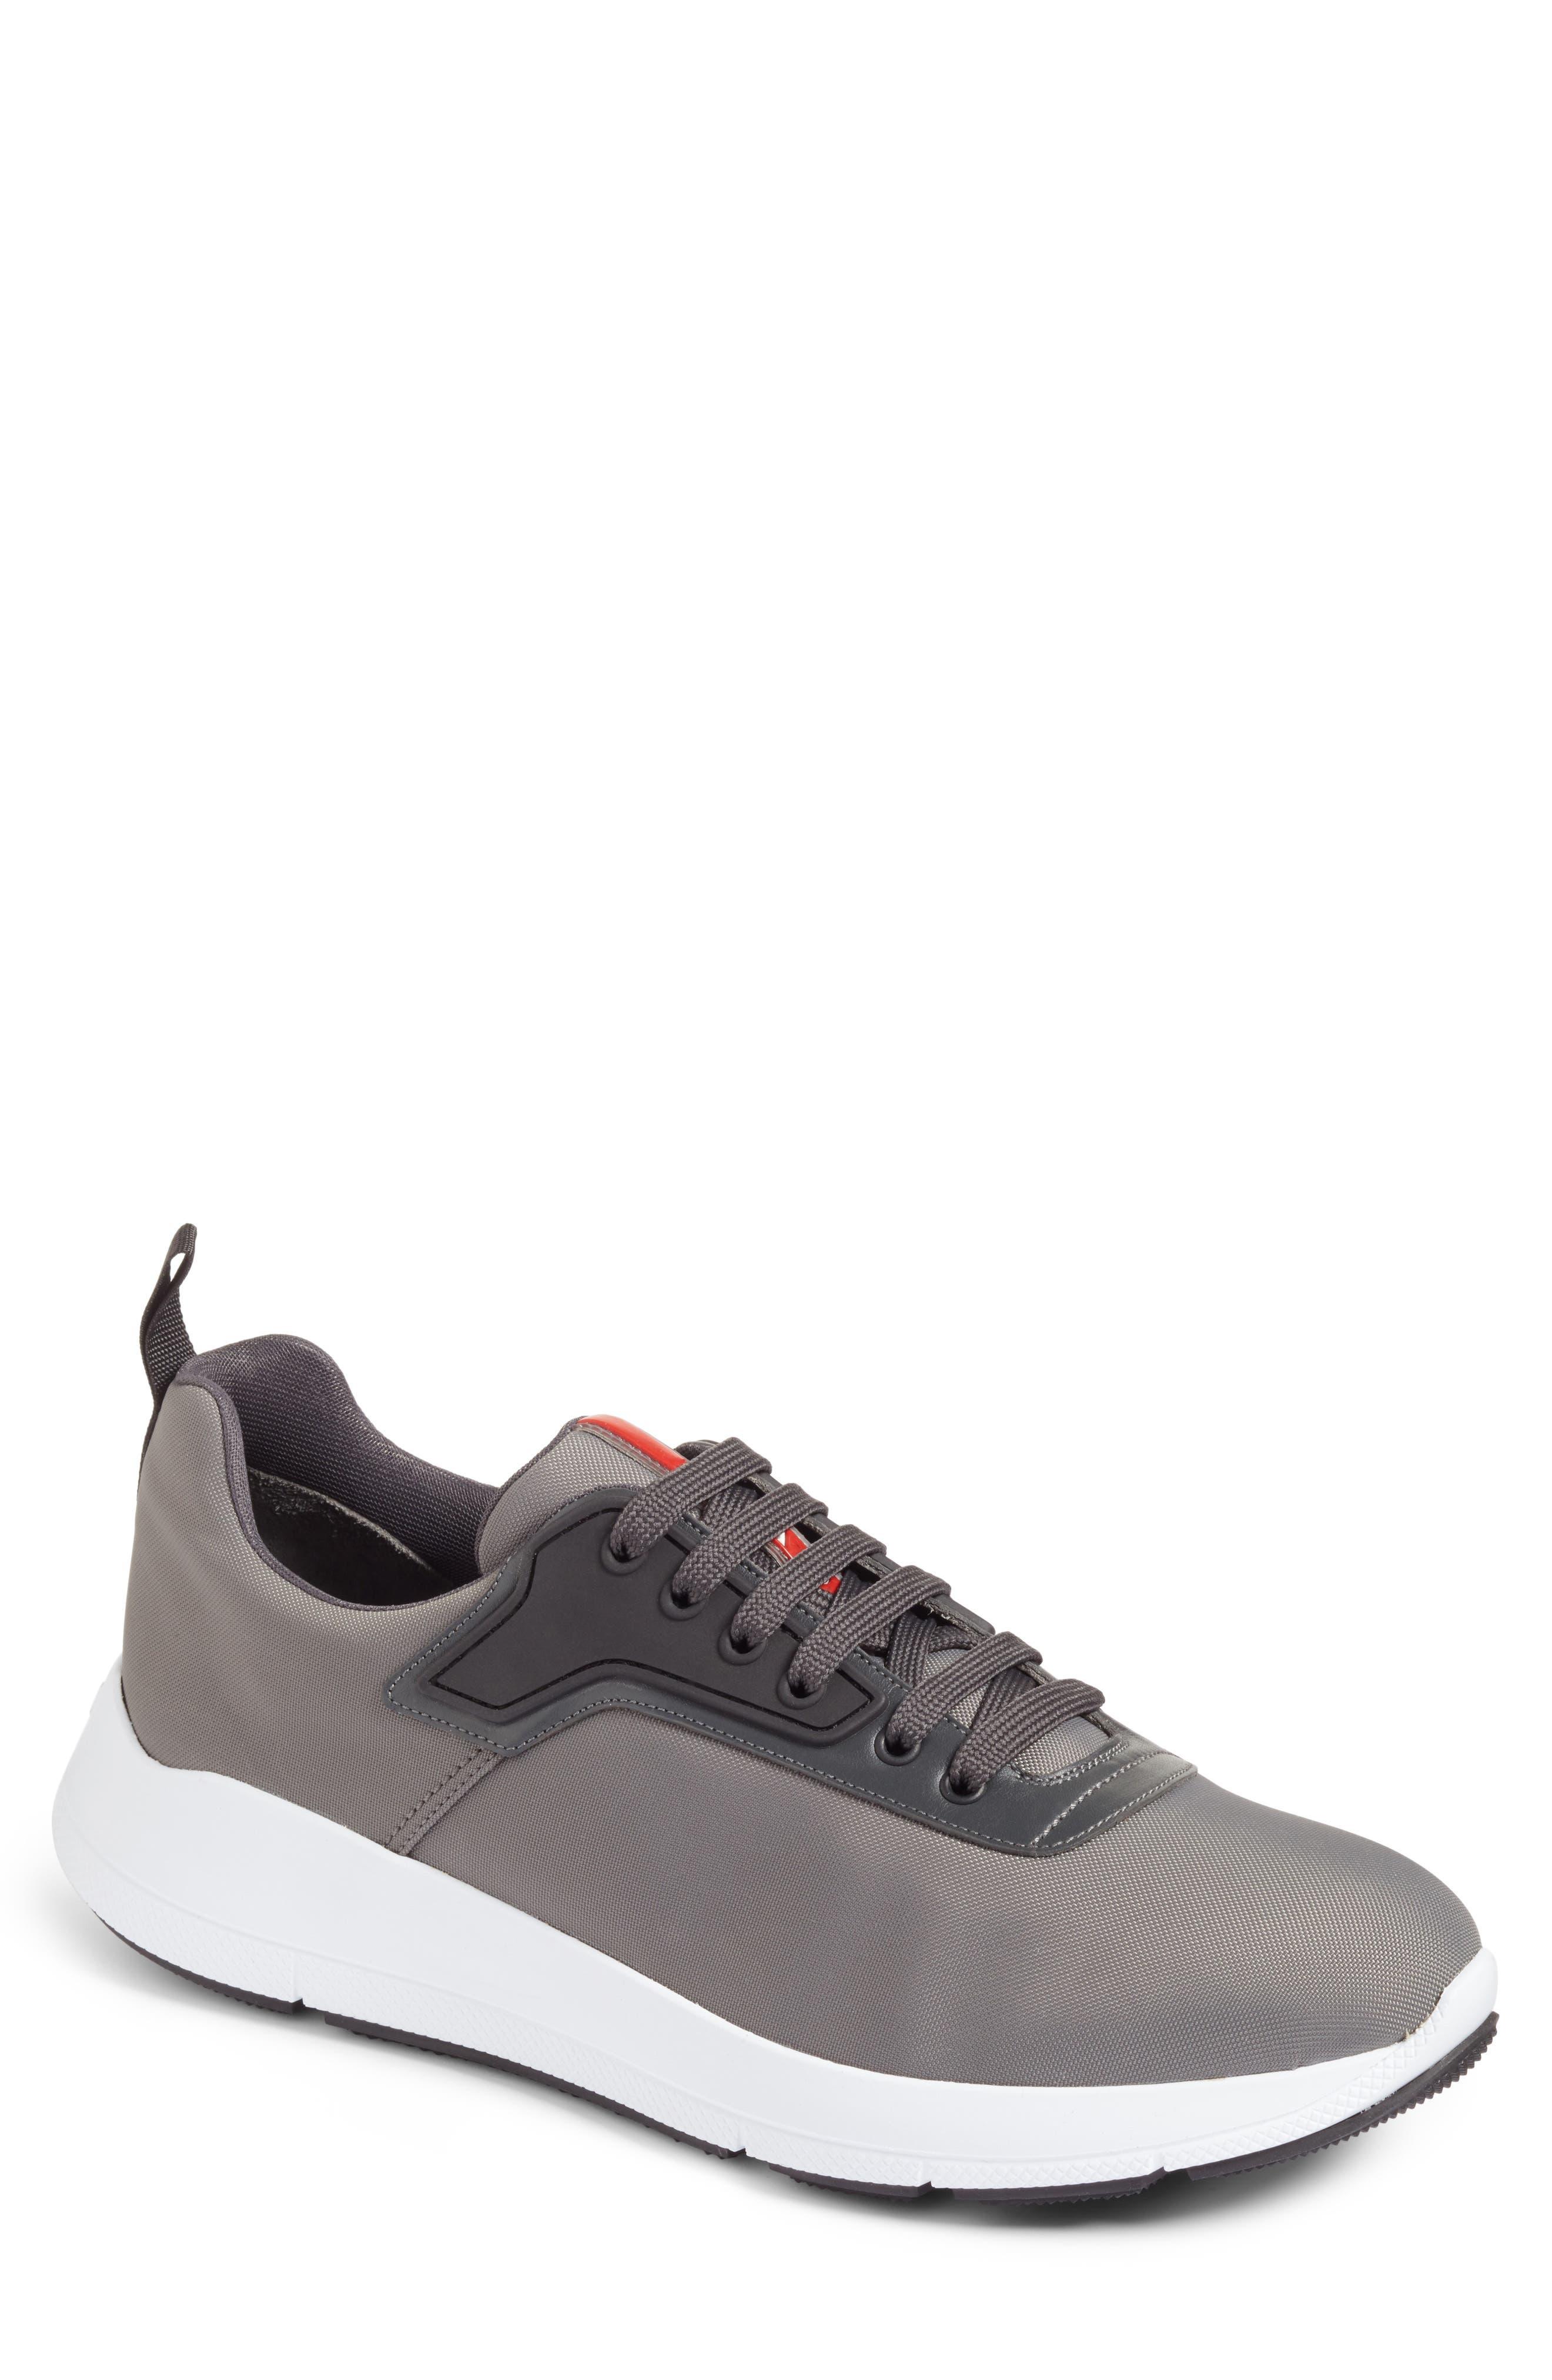 Prada Linea Rossa Tech Sneaker (Men)